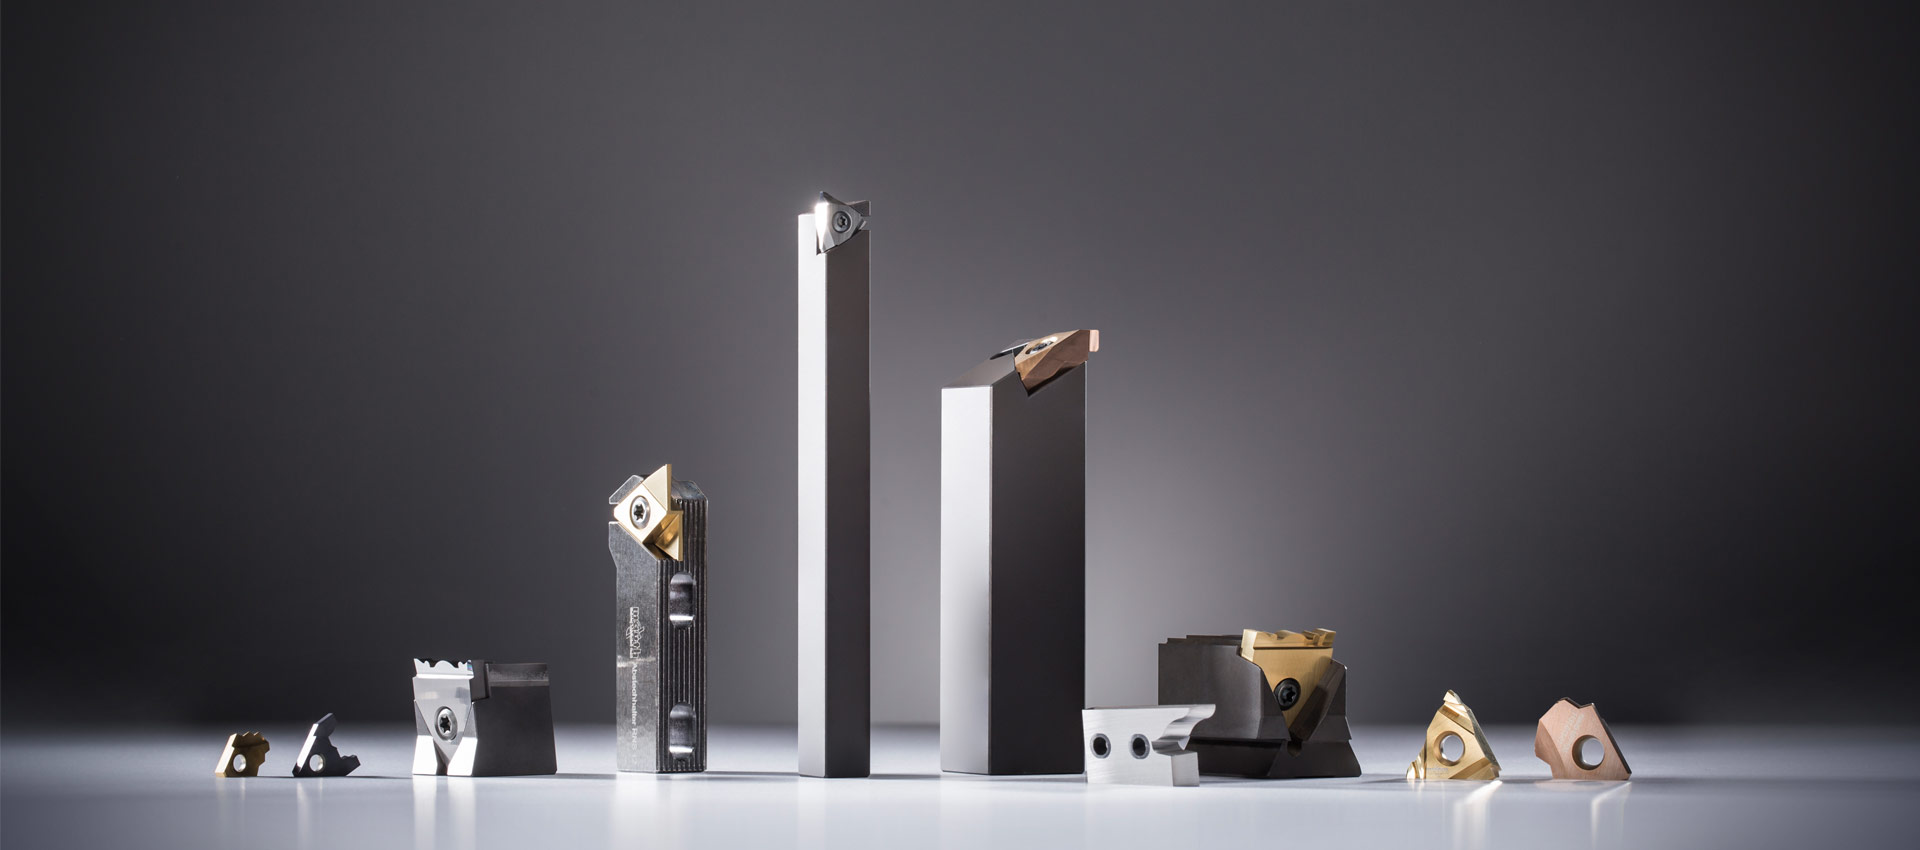 Mauth Werkzeuglösungen - Formstechplatten